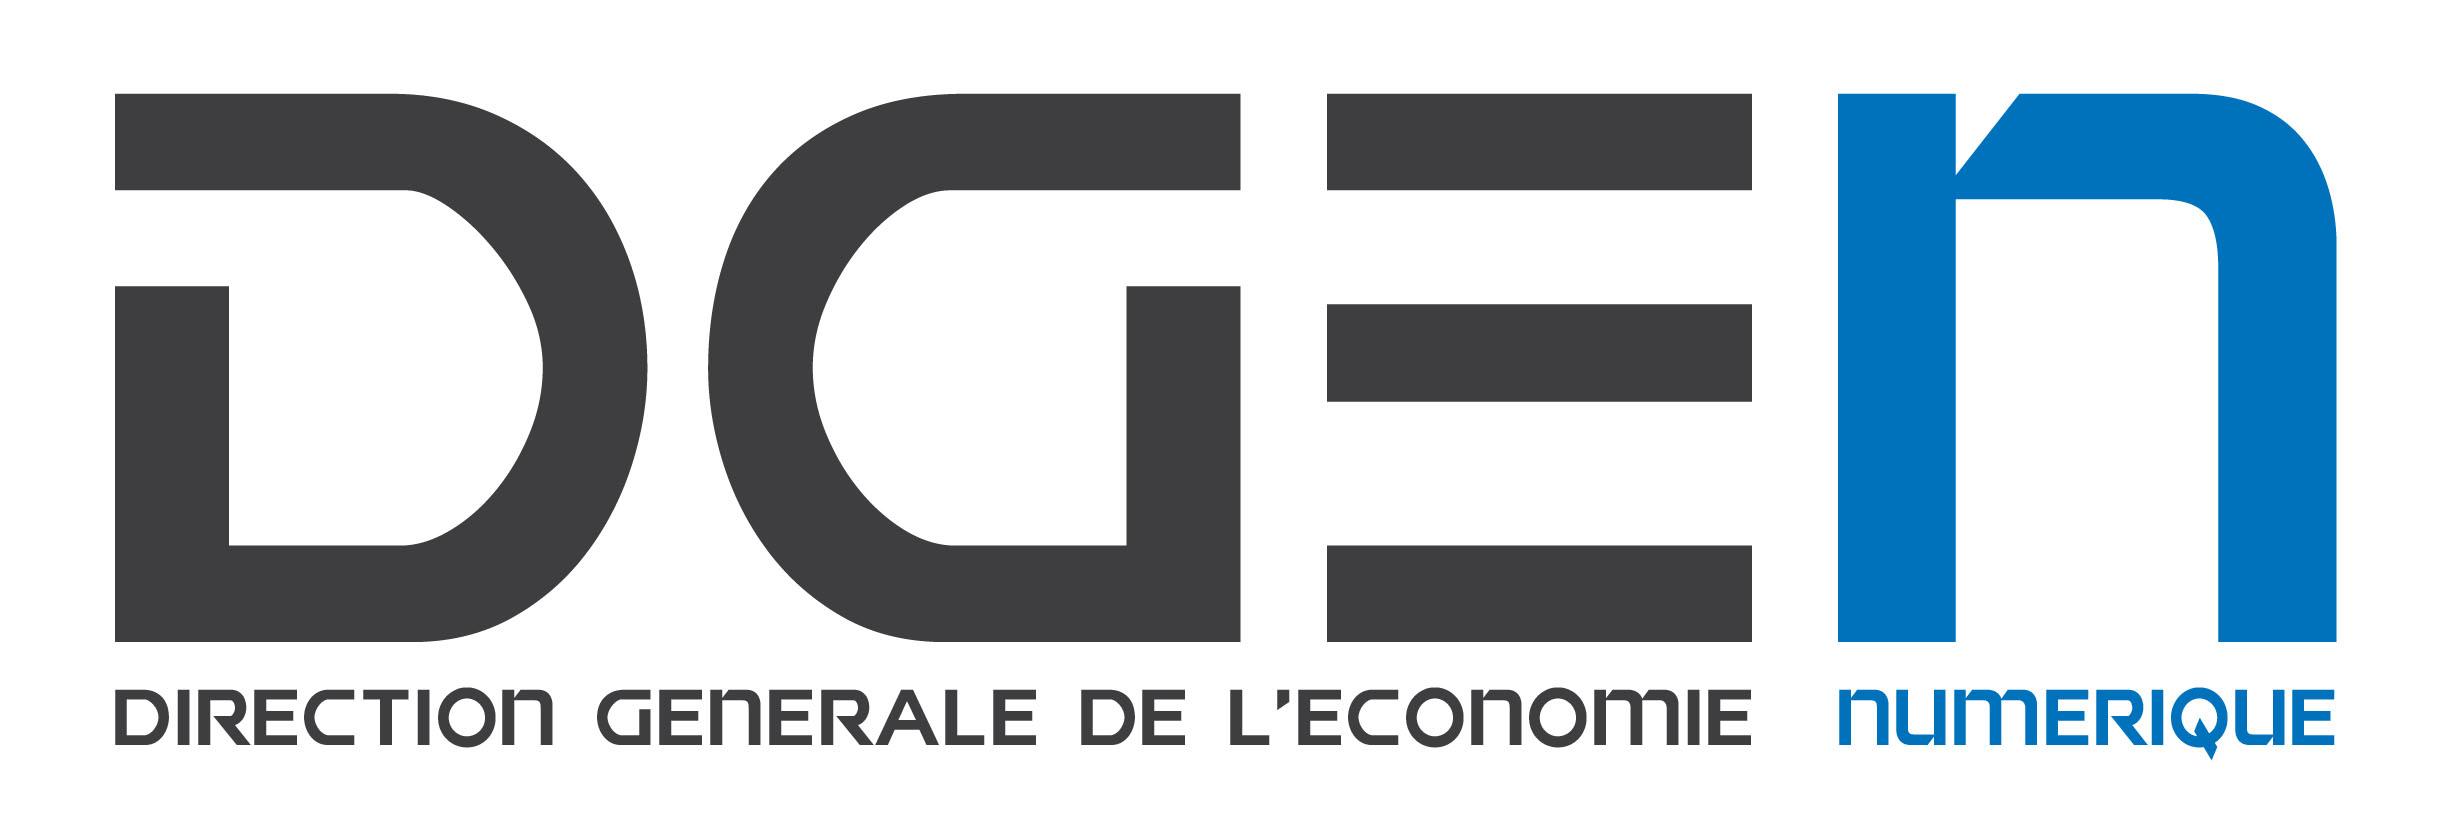 logo-dgen-2016